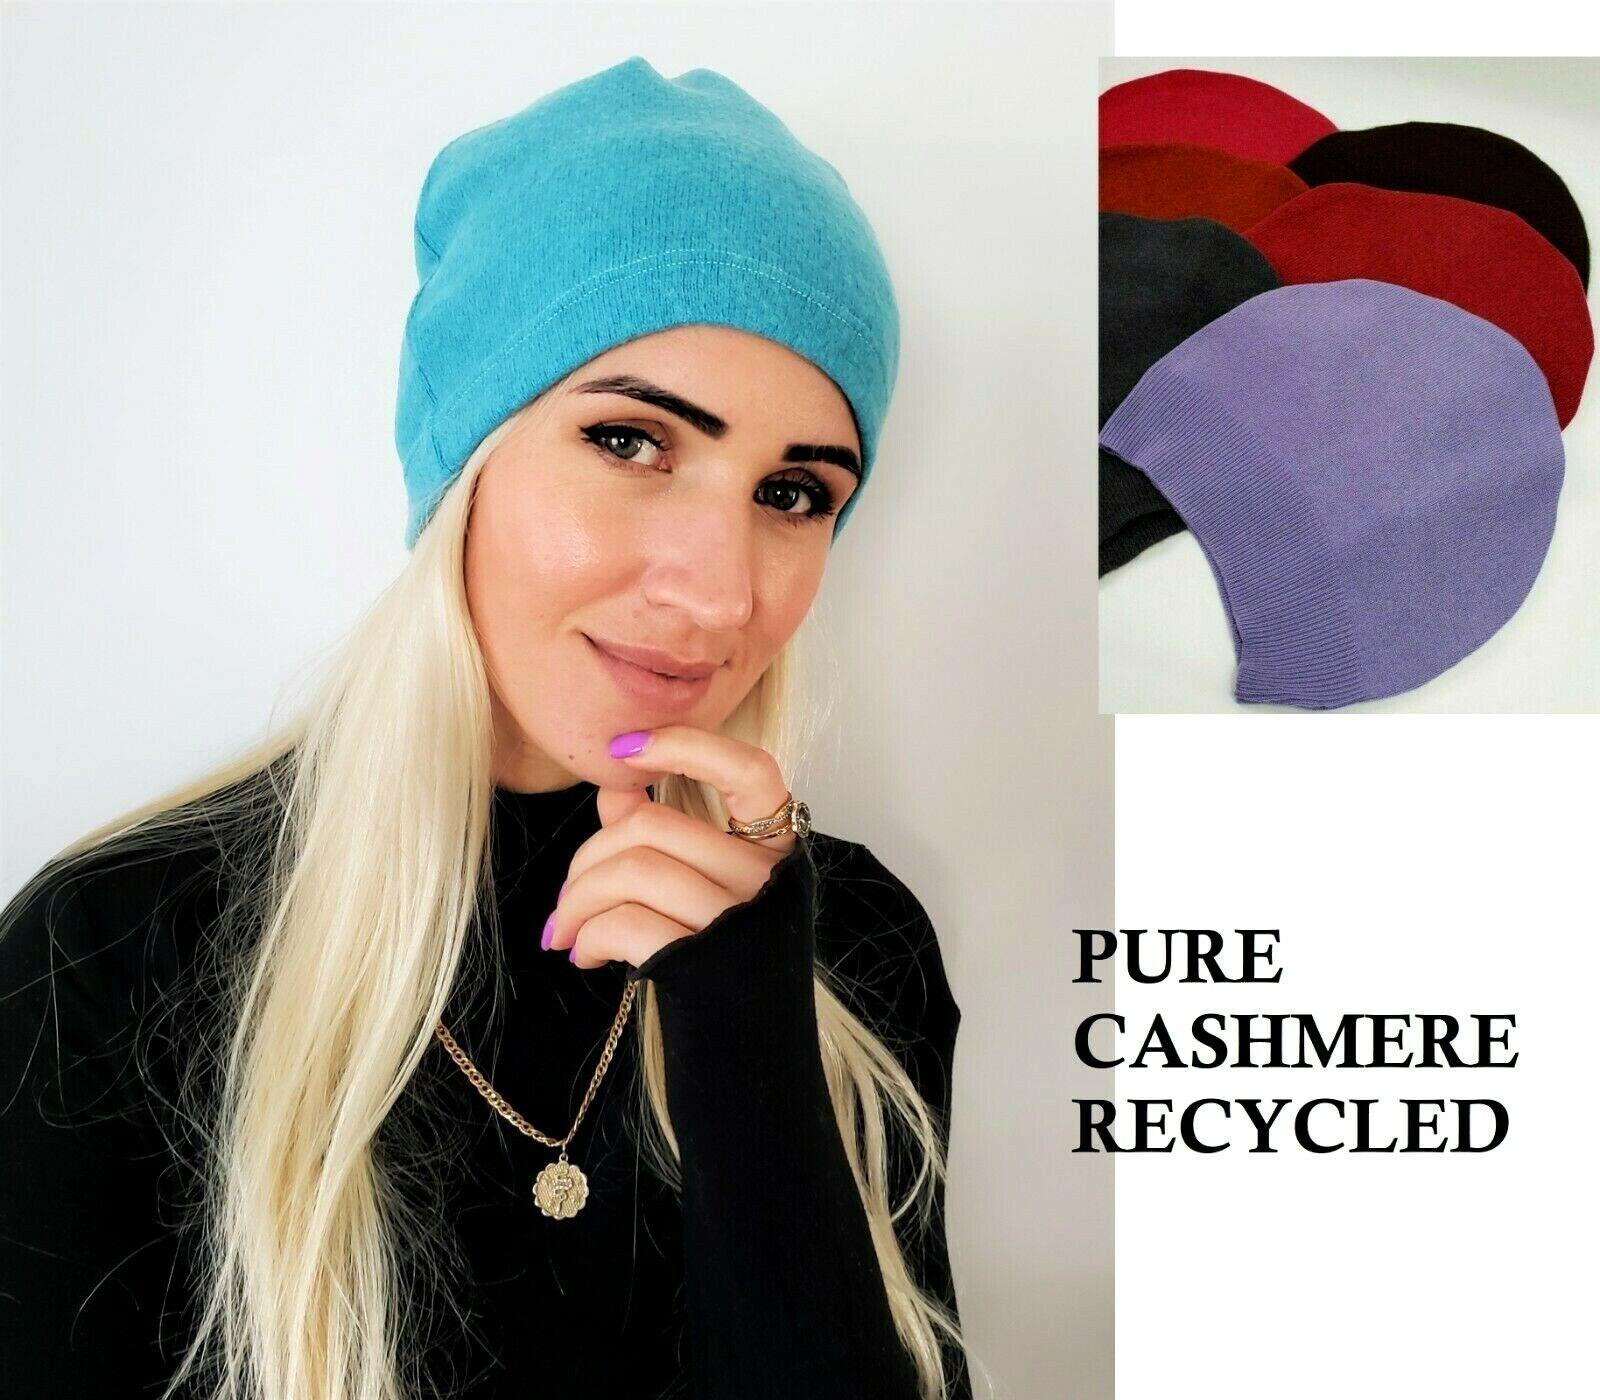 # 100% Pure Cashmere Sombrero Gorro de Lana Hombre Mujer Unisex Hecho a Mano A004